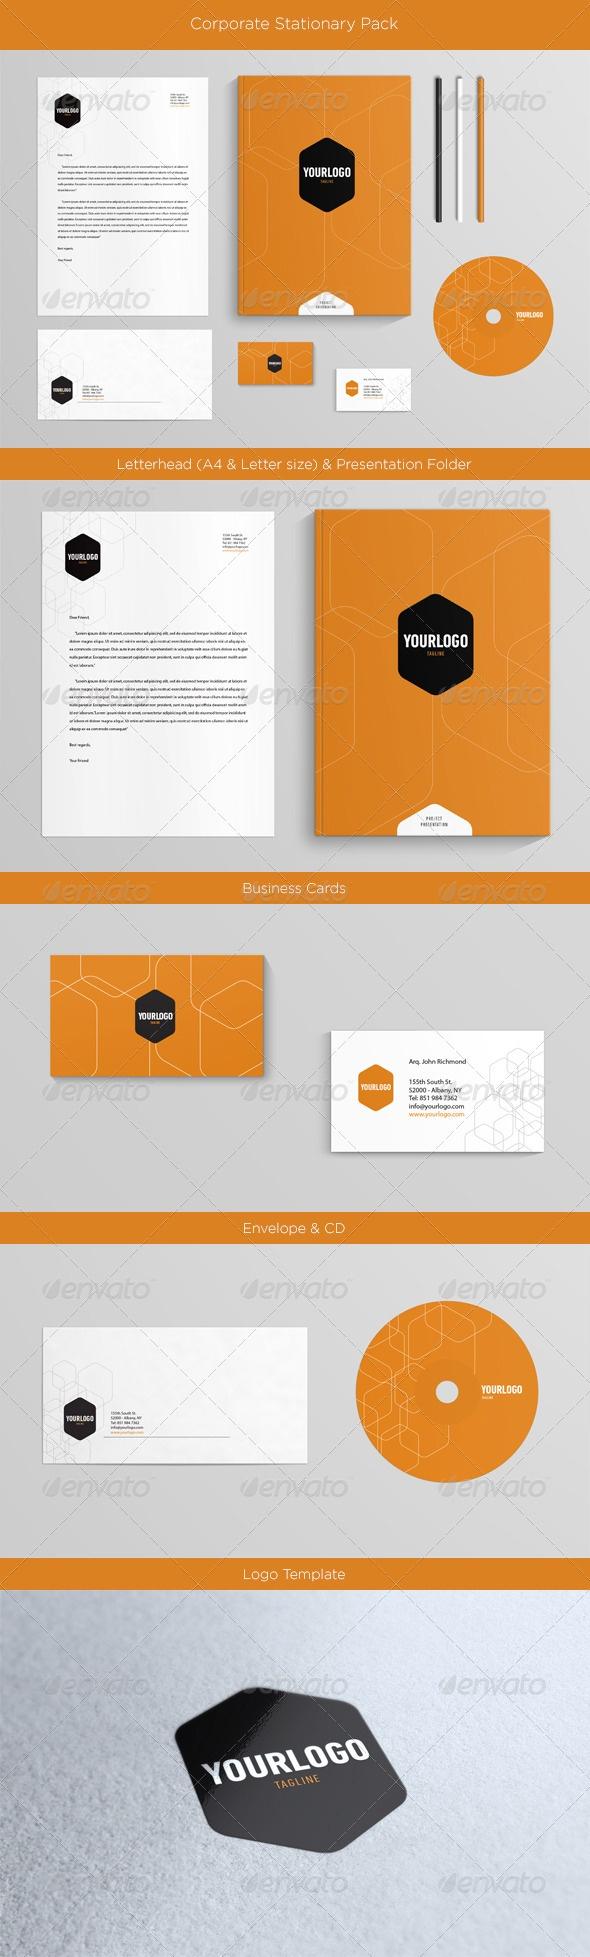 44 best Briefpapier images on Pinterest   Brand design, Corporate ...